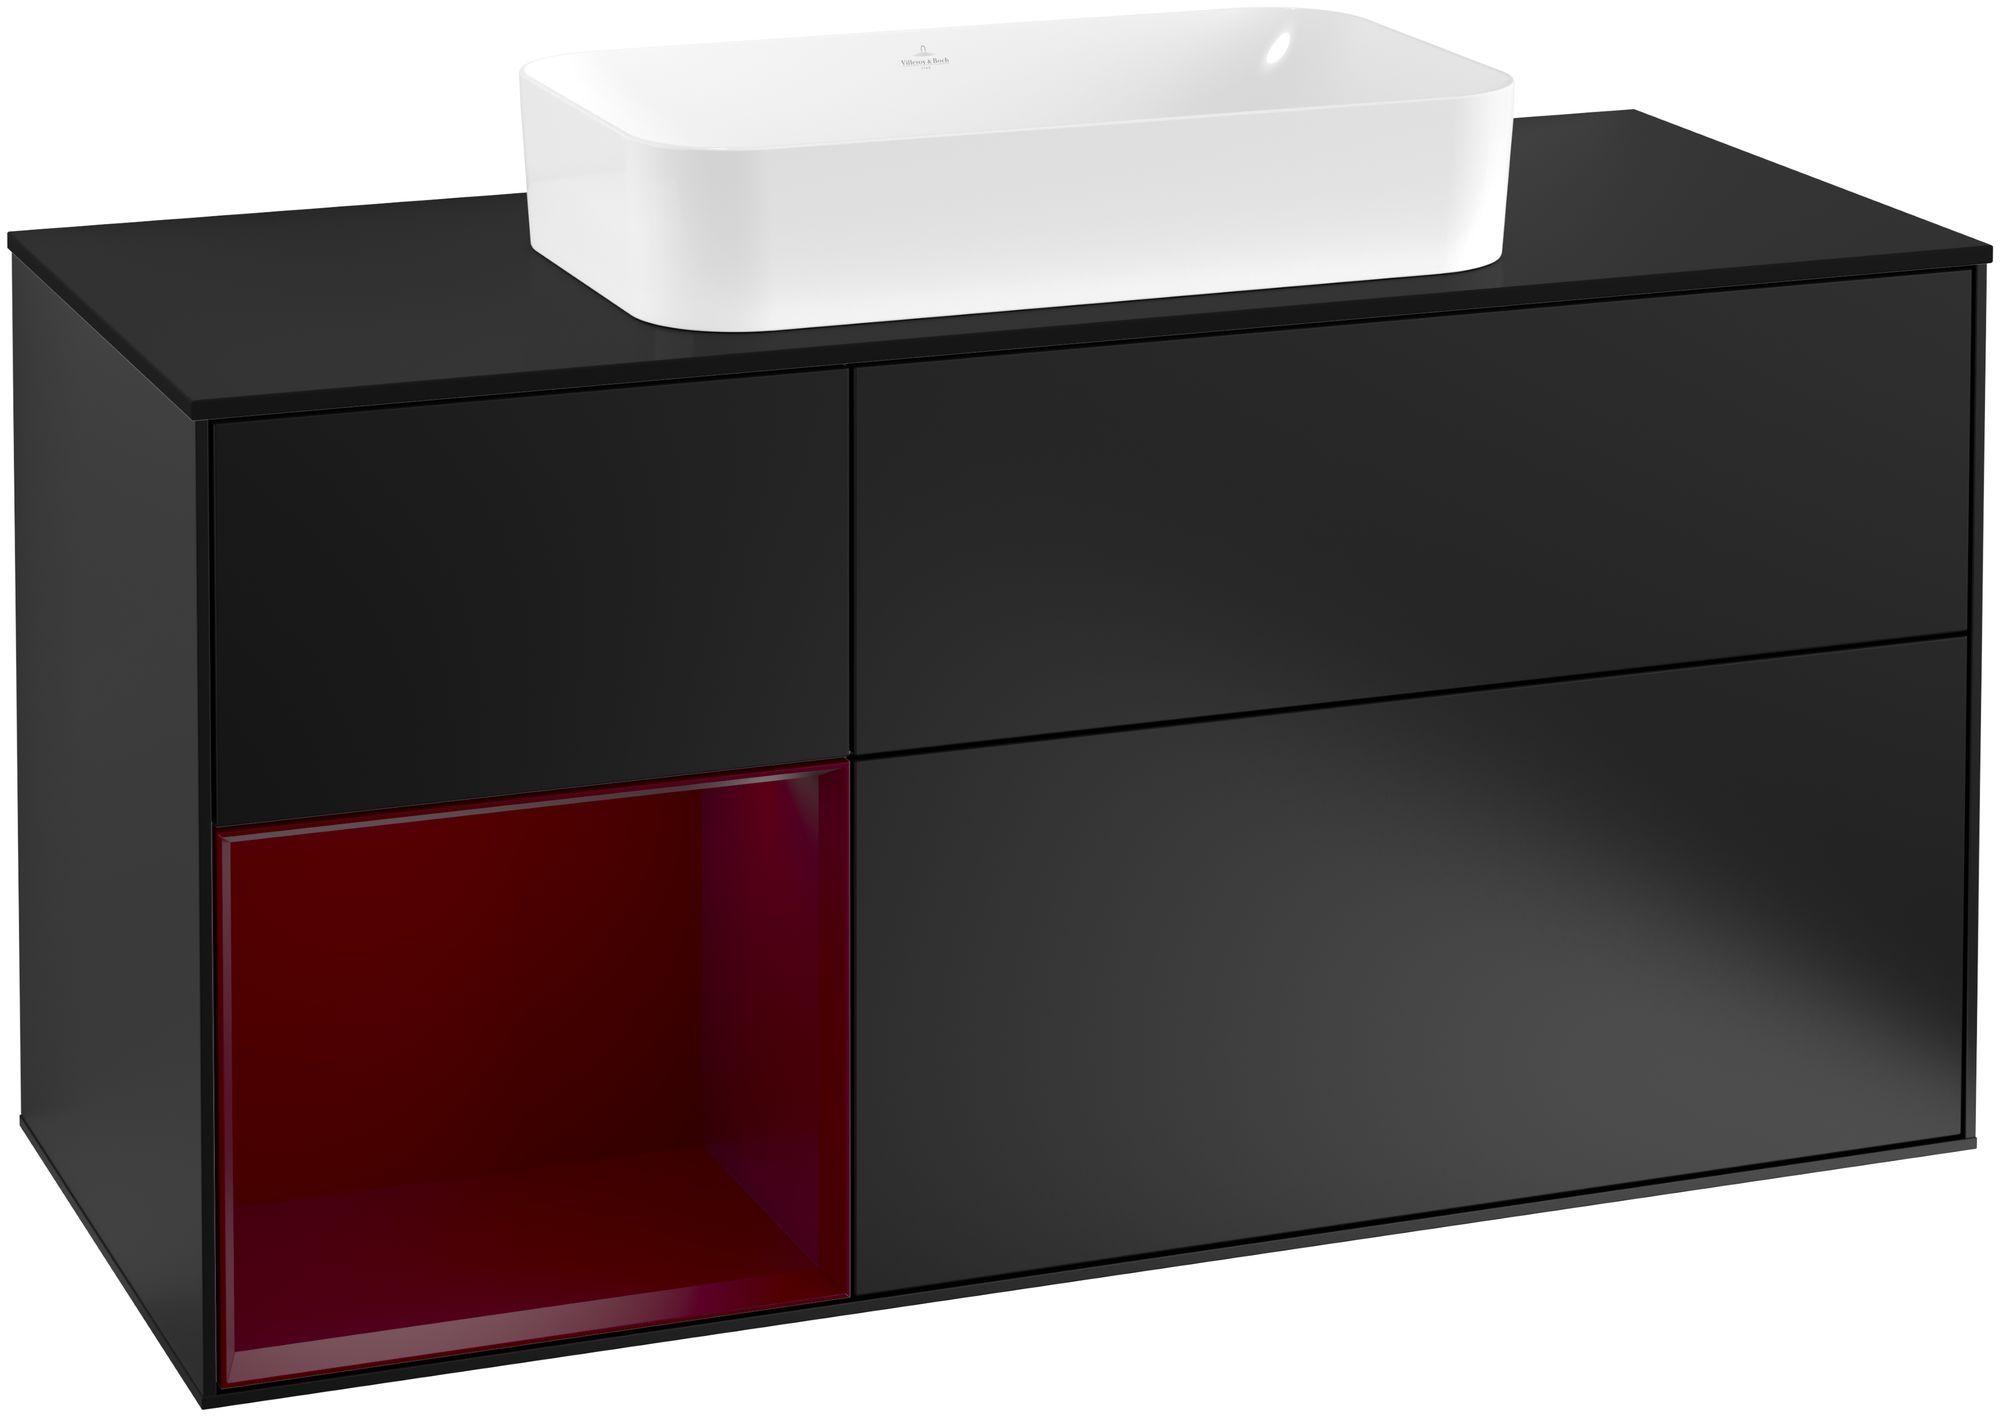 Villeroy & Boch Finion F29 Waschtischunterschrank mit Regalelement 3 Auszüge Waschtisch mittig LED-Beleuchtung B:120xH:60,3xT:50,1cm Front, Korpus: Black Matt Lacquer, Regal: Peony, Glasplatte: Black Matt F292HBPD